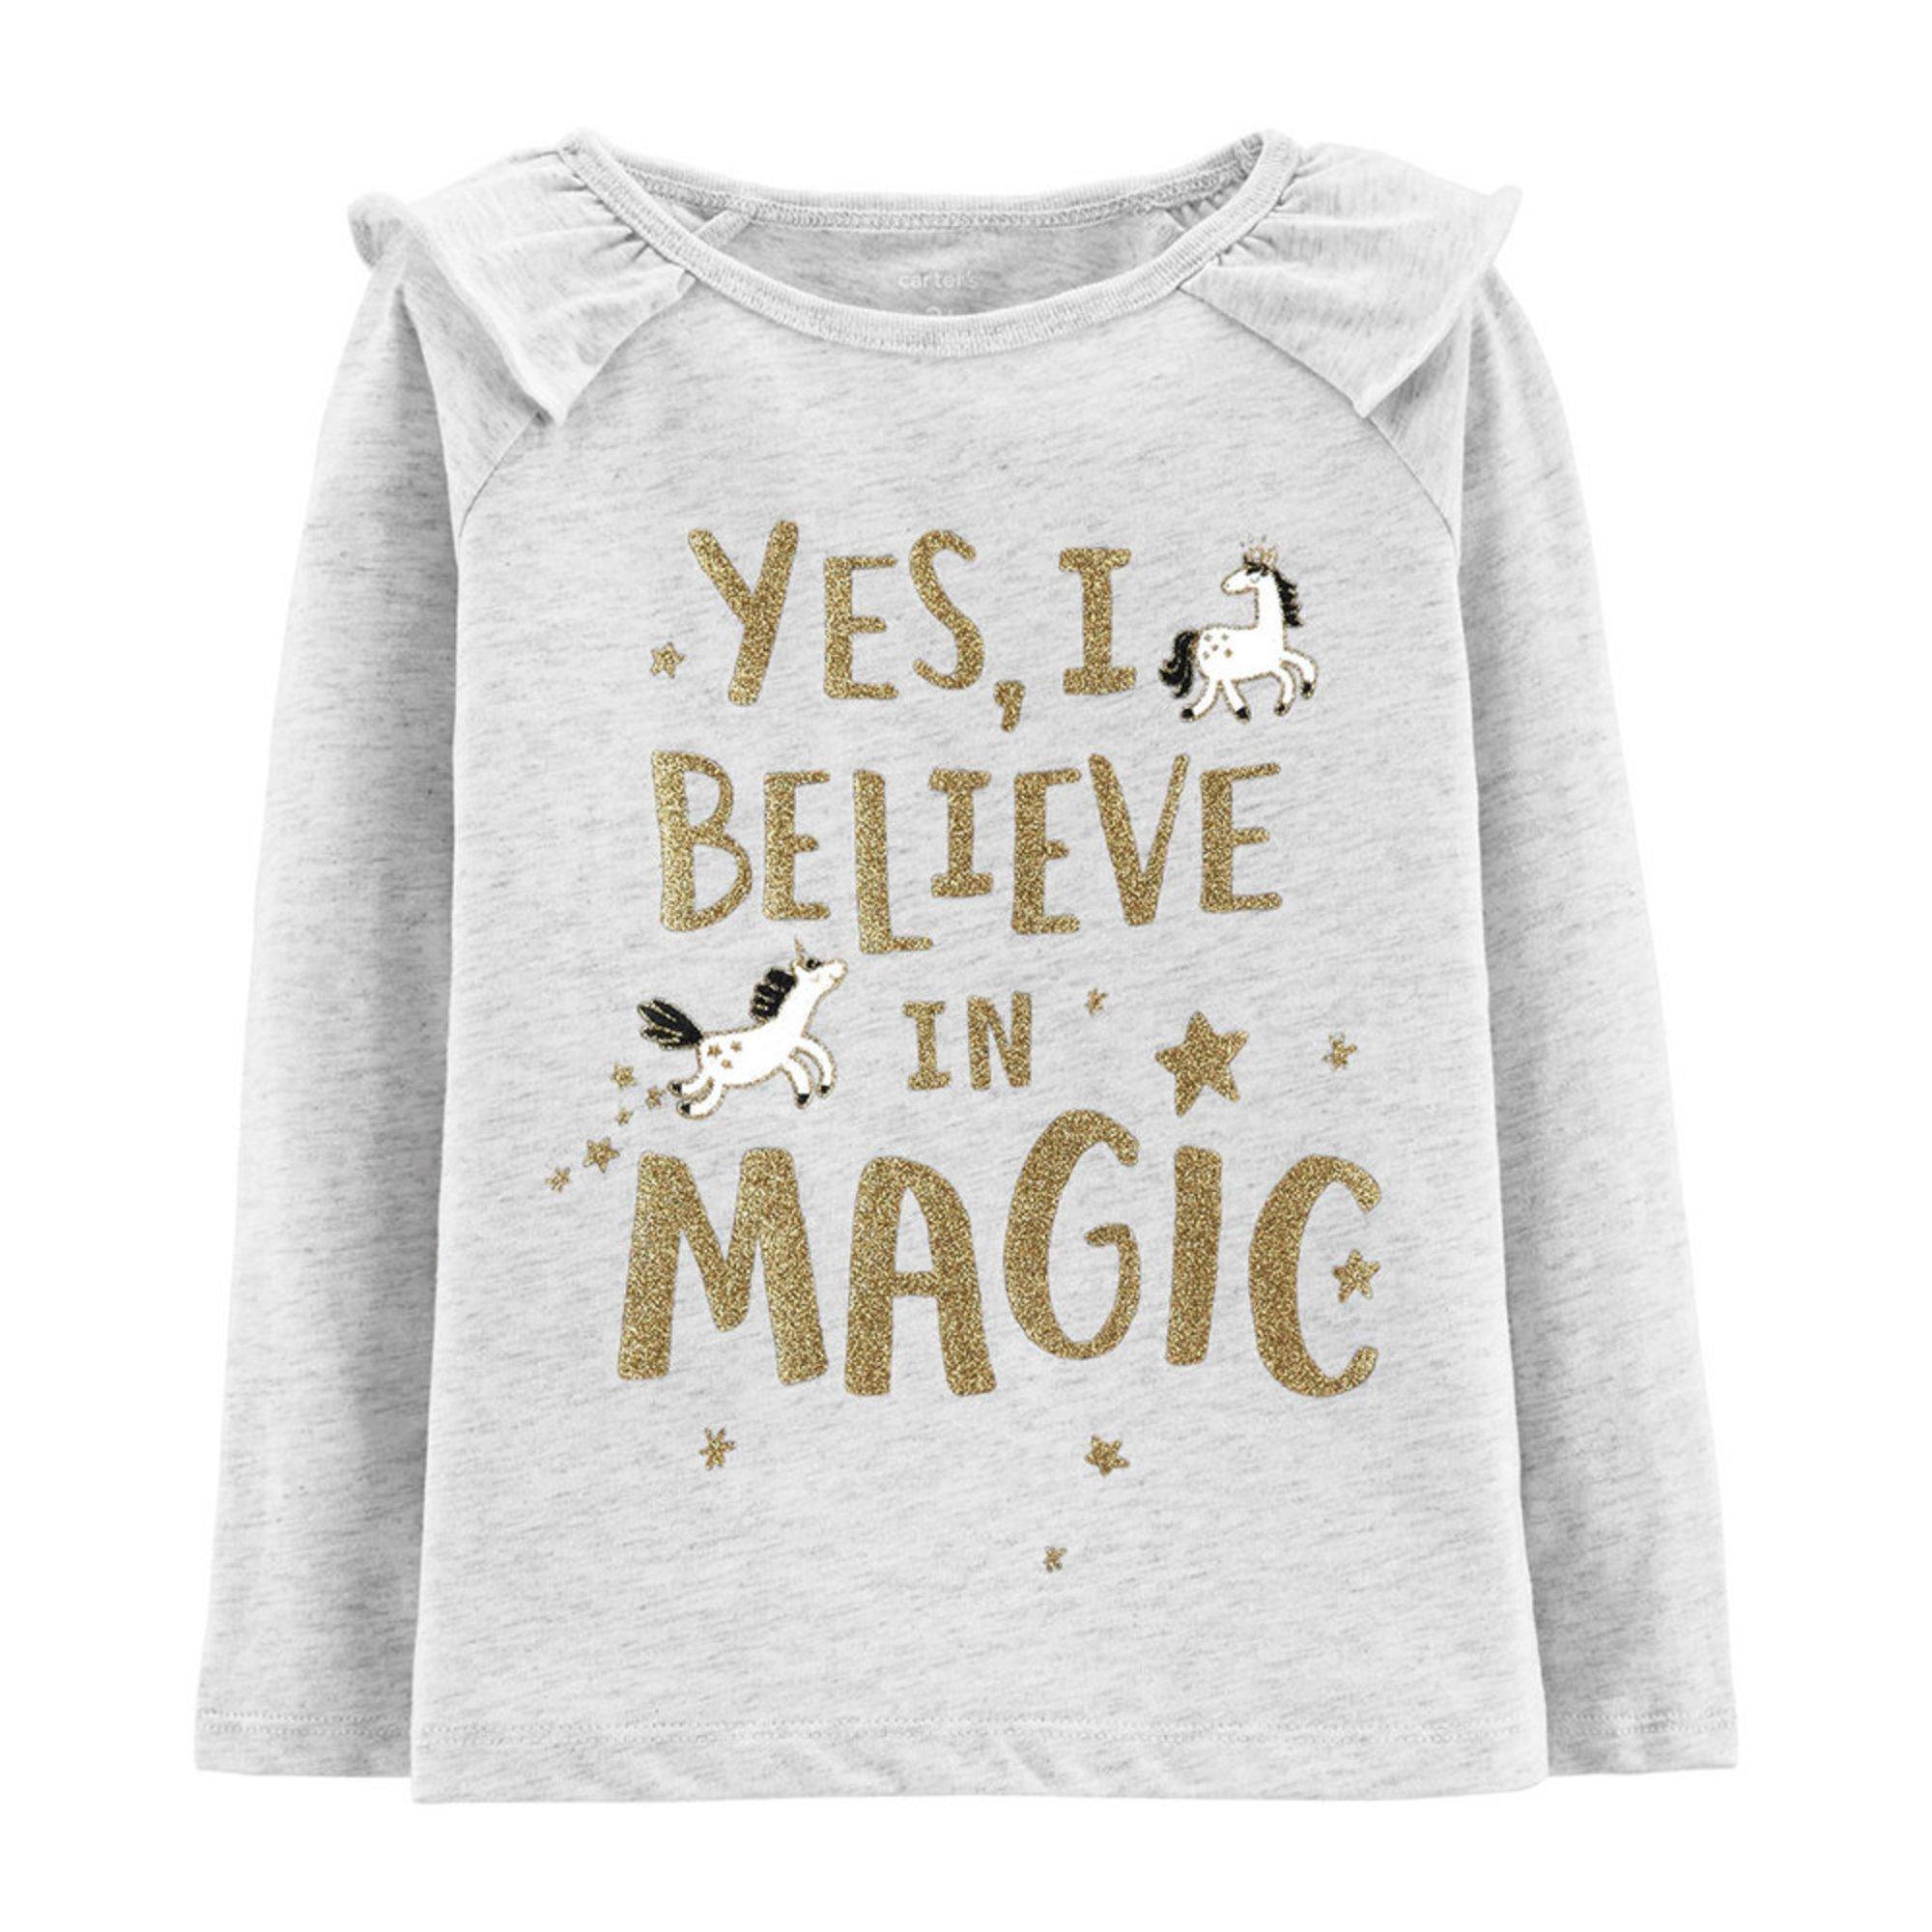 ea0a05c1 Carter's Toddler Girls' Believe In Magic Tee   Little Girls' Tops ...